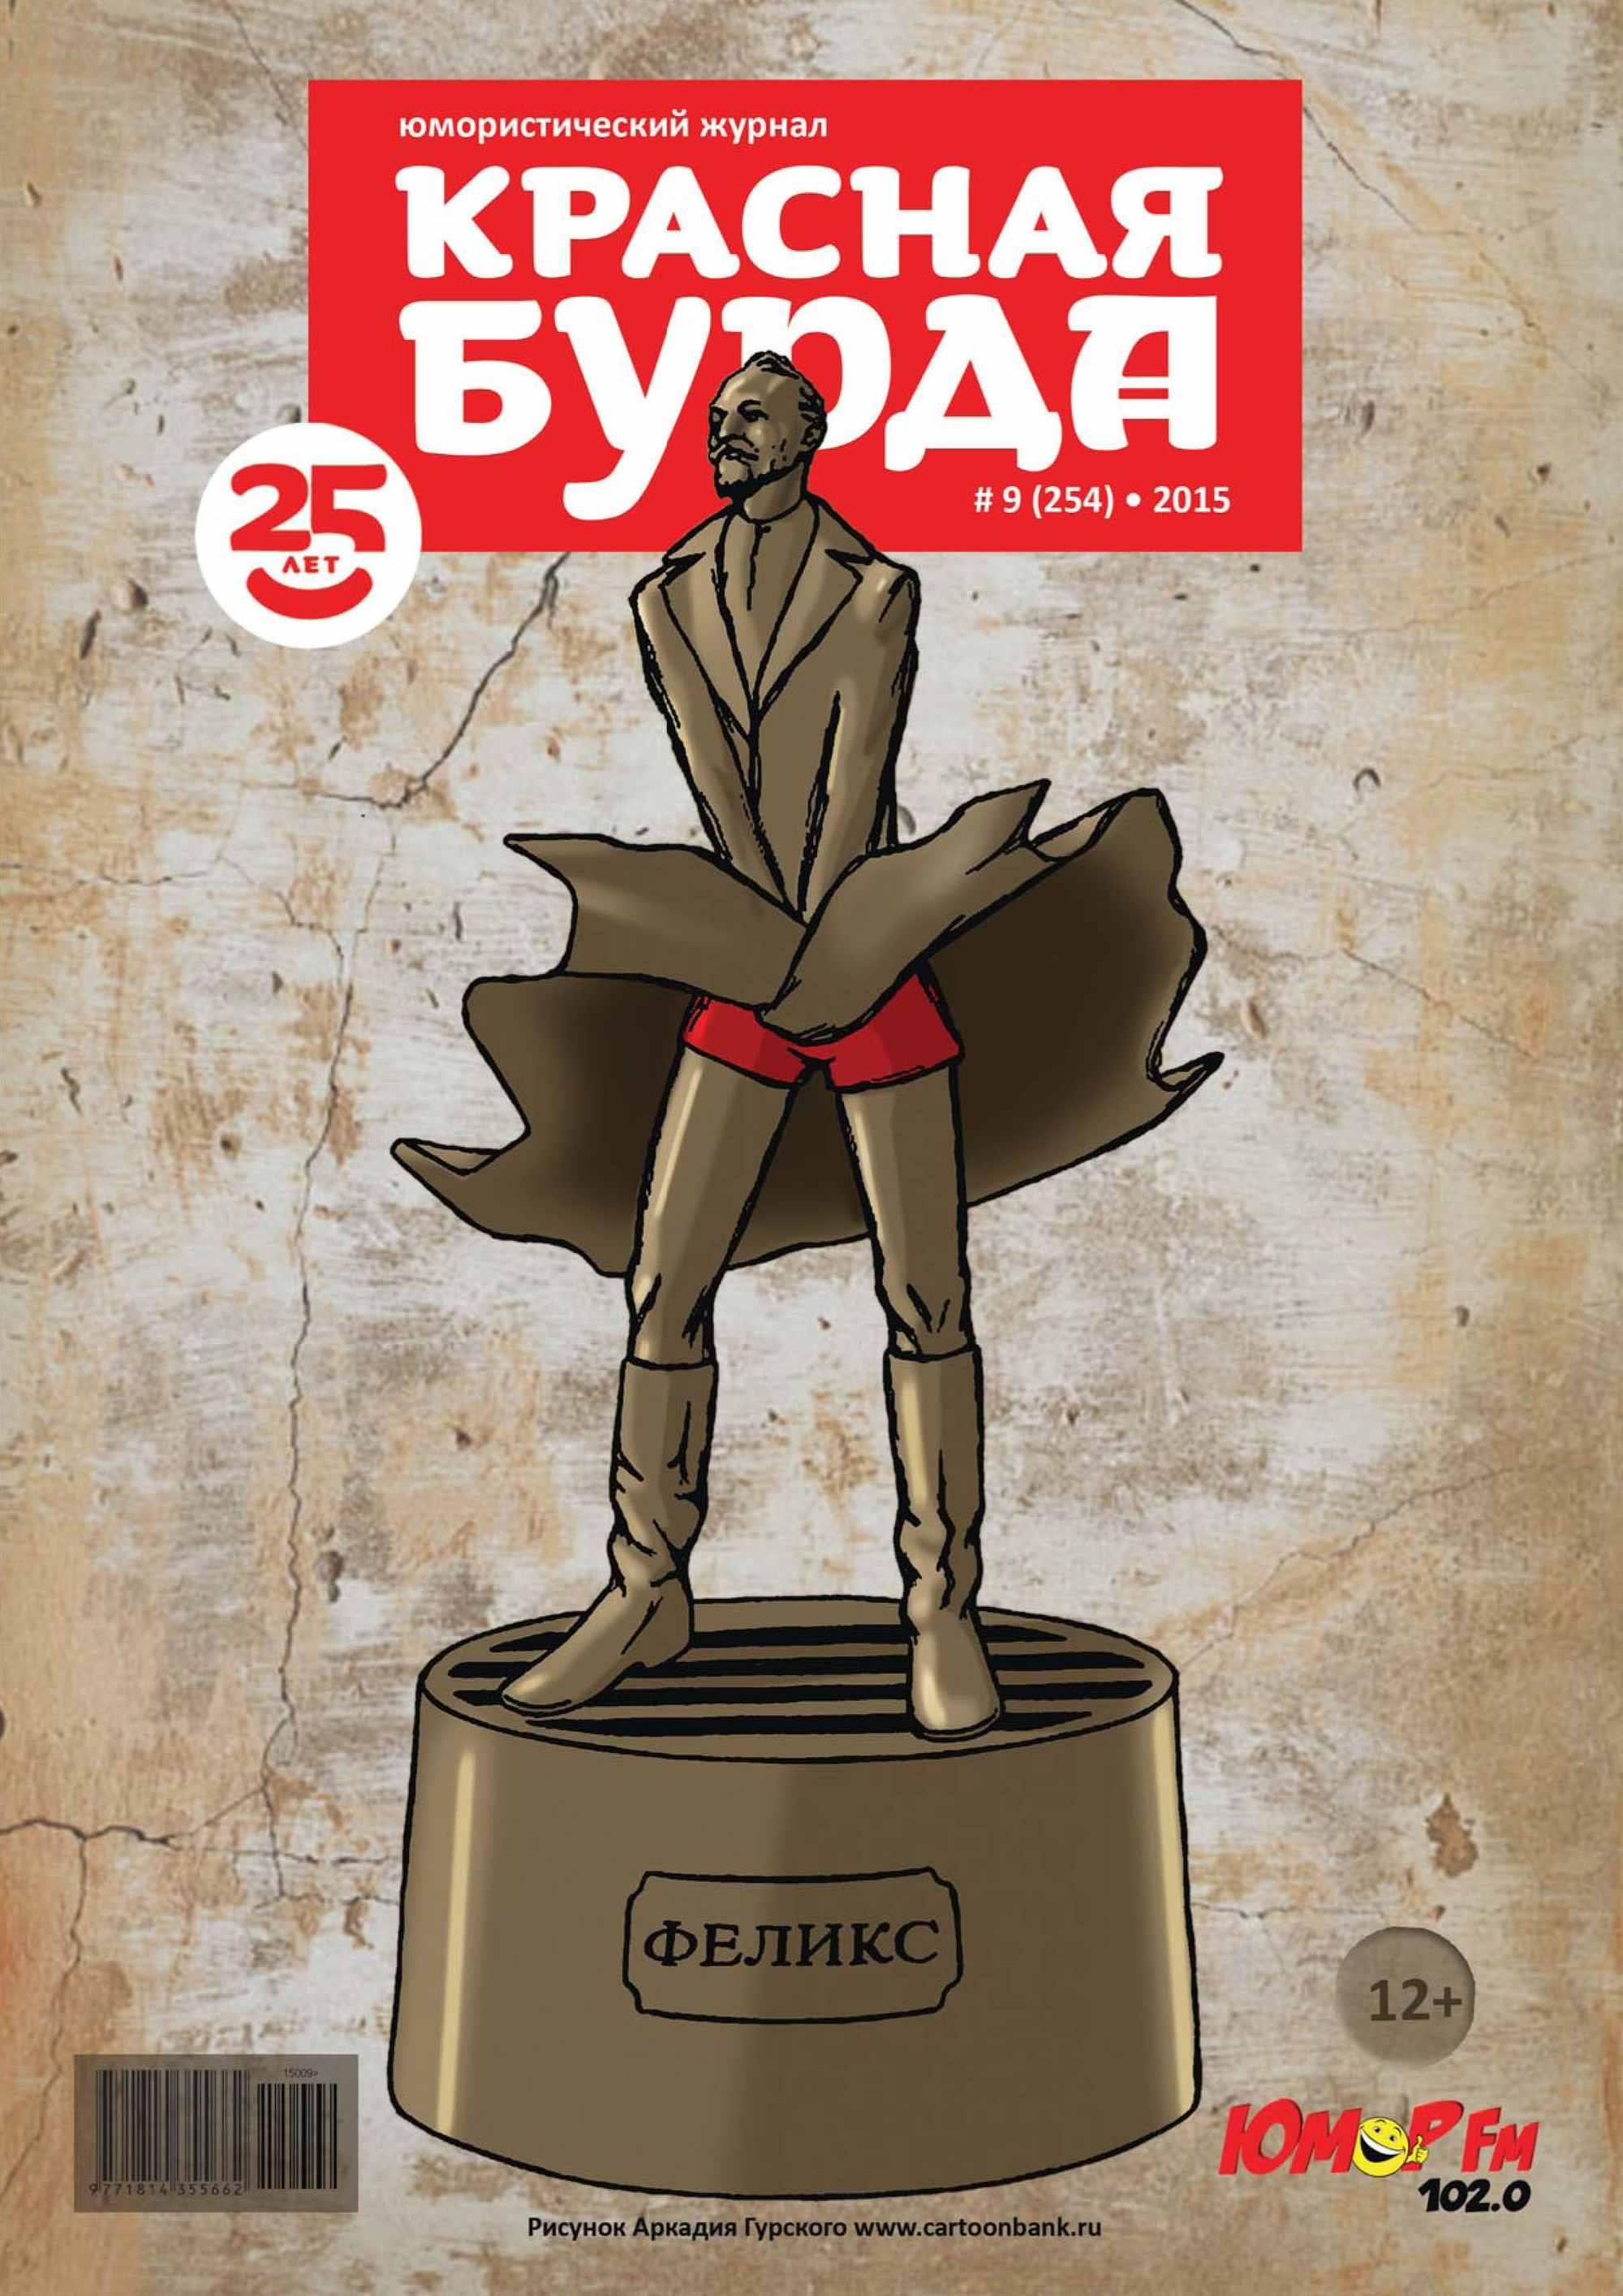 Красная бурда. Юмористический журнал №09 (254) 2015